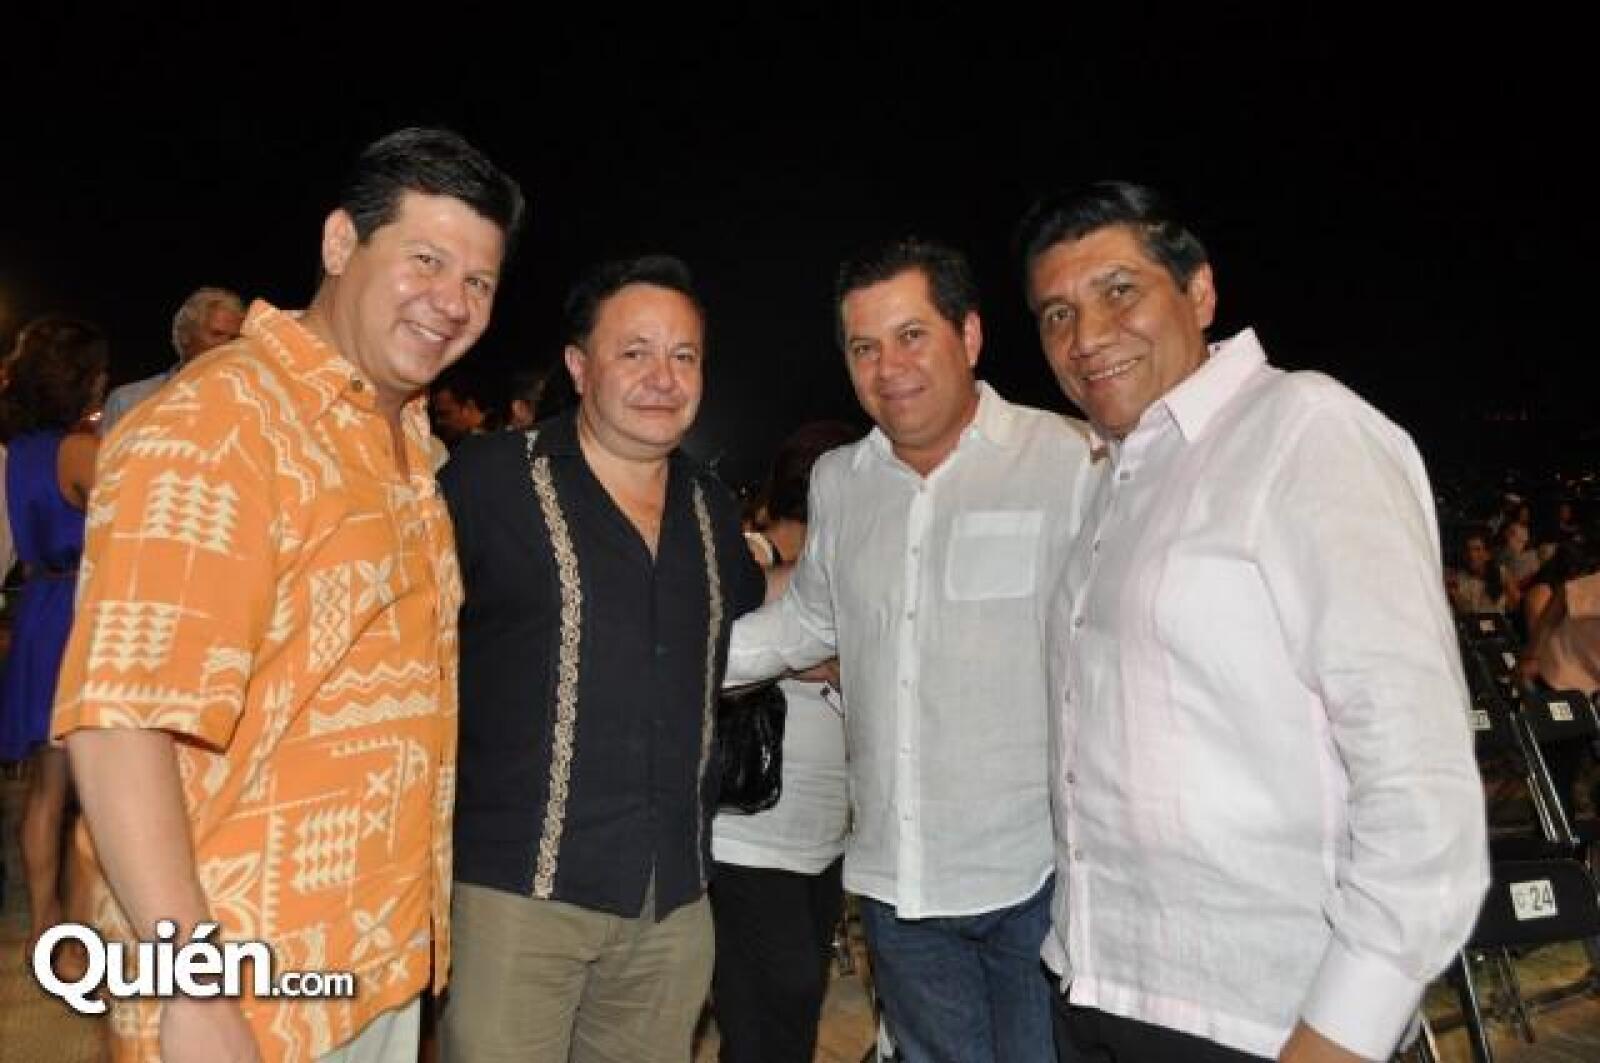 Arturo Palma Carro, Ramon Guadarama, Ricardo Moreno y Mario Moreno.